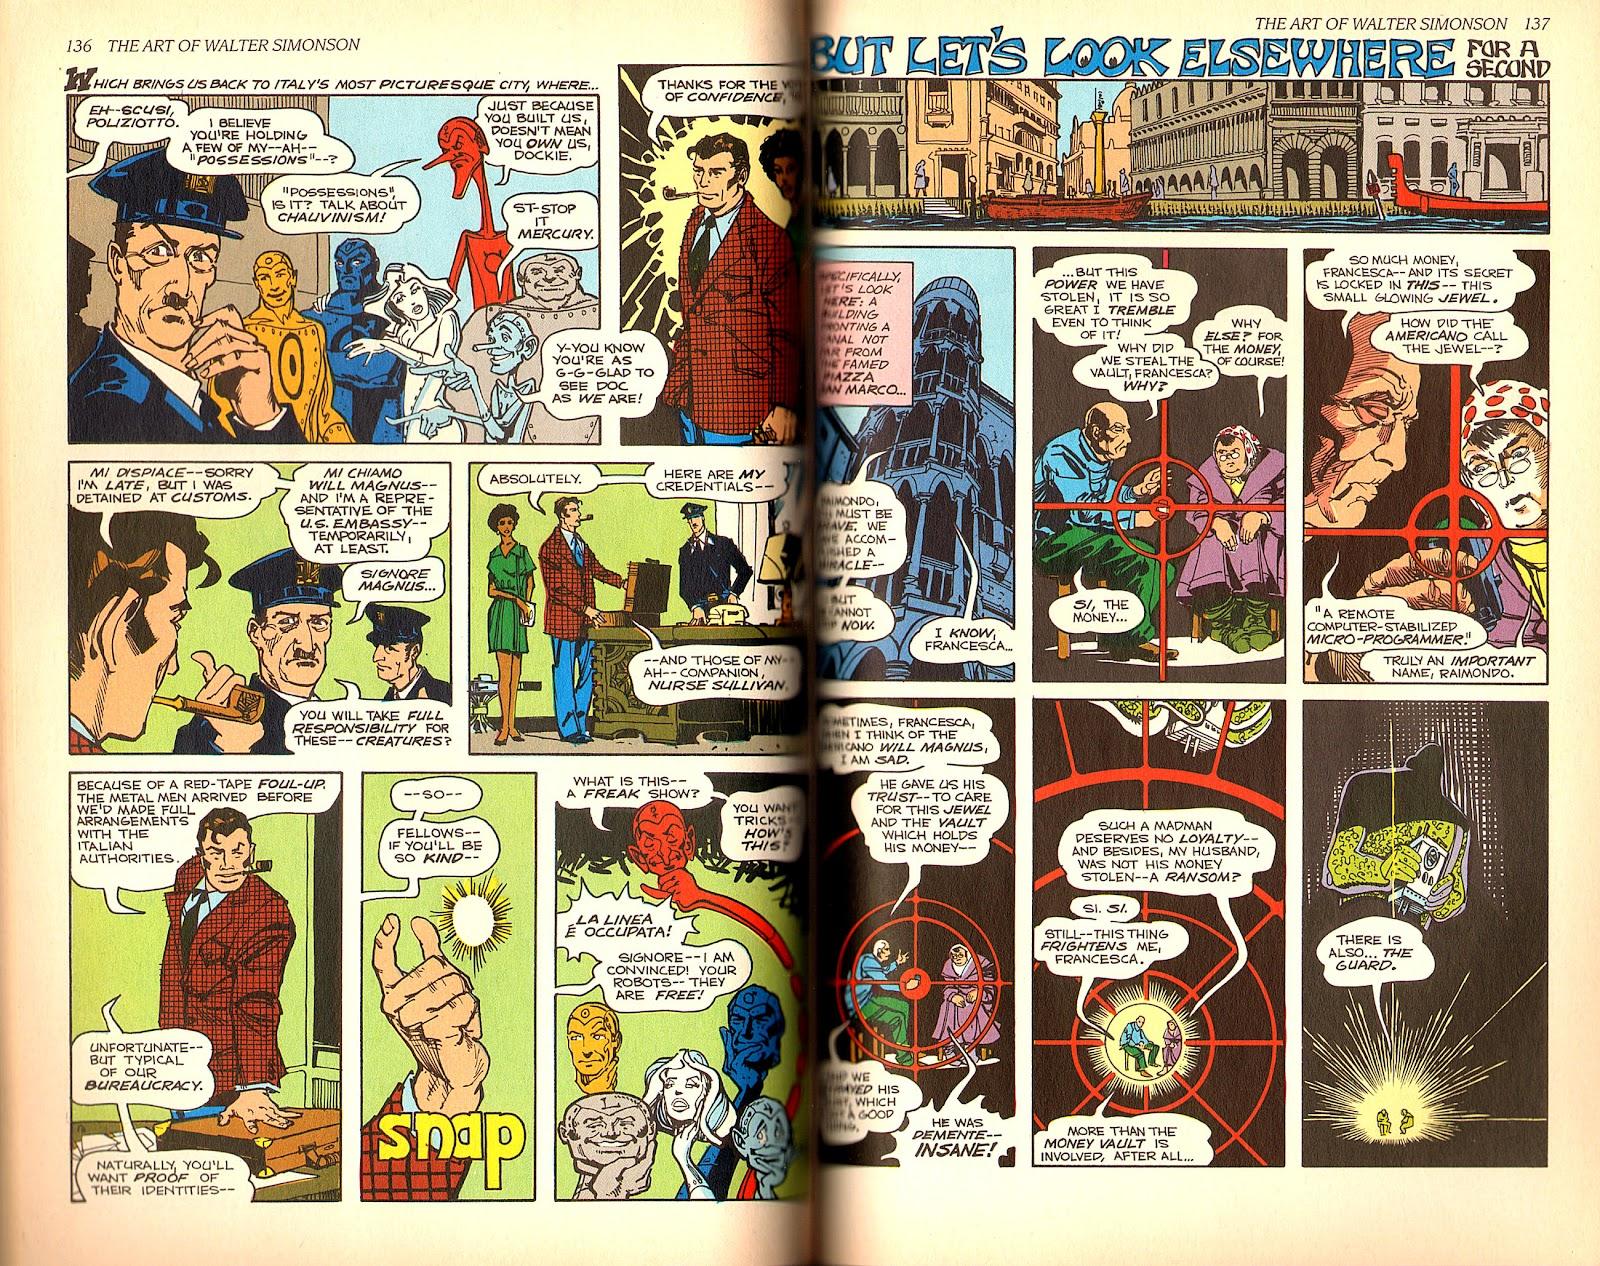 Read online The Art of Walter Simonson comic -  Issue # TPB - 70